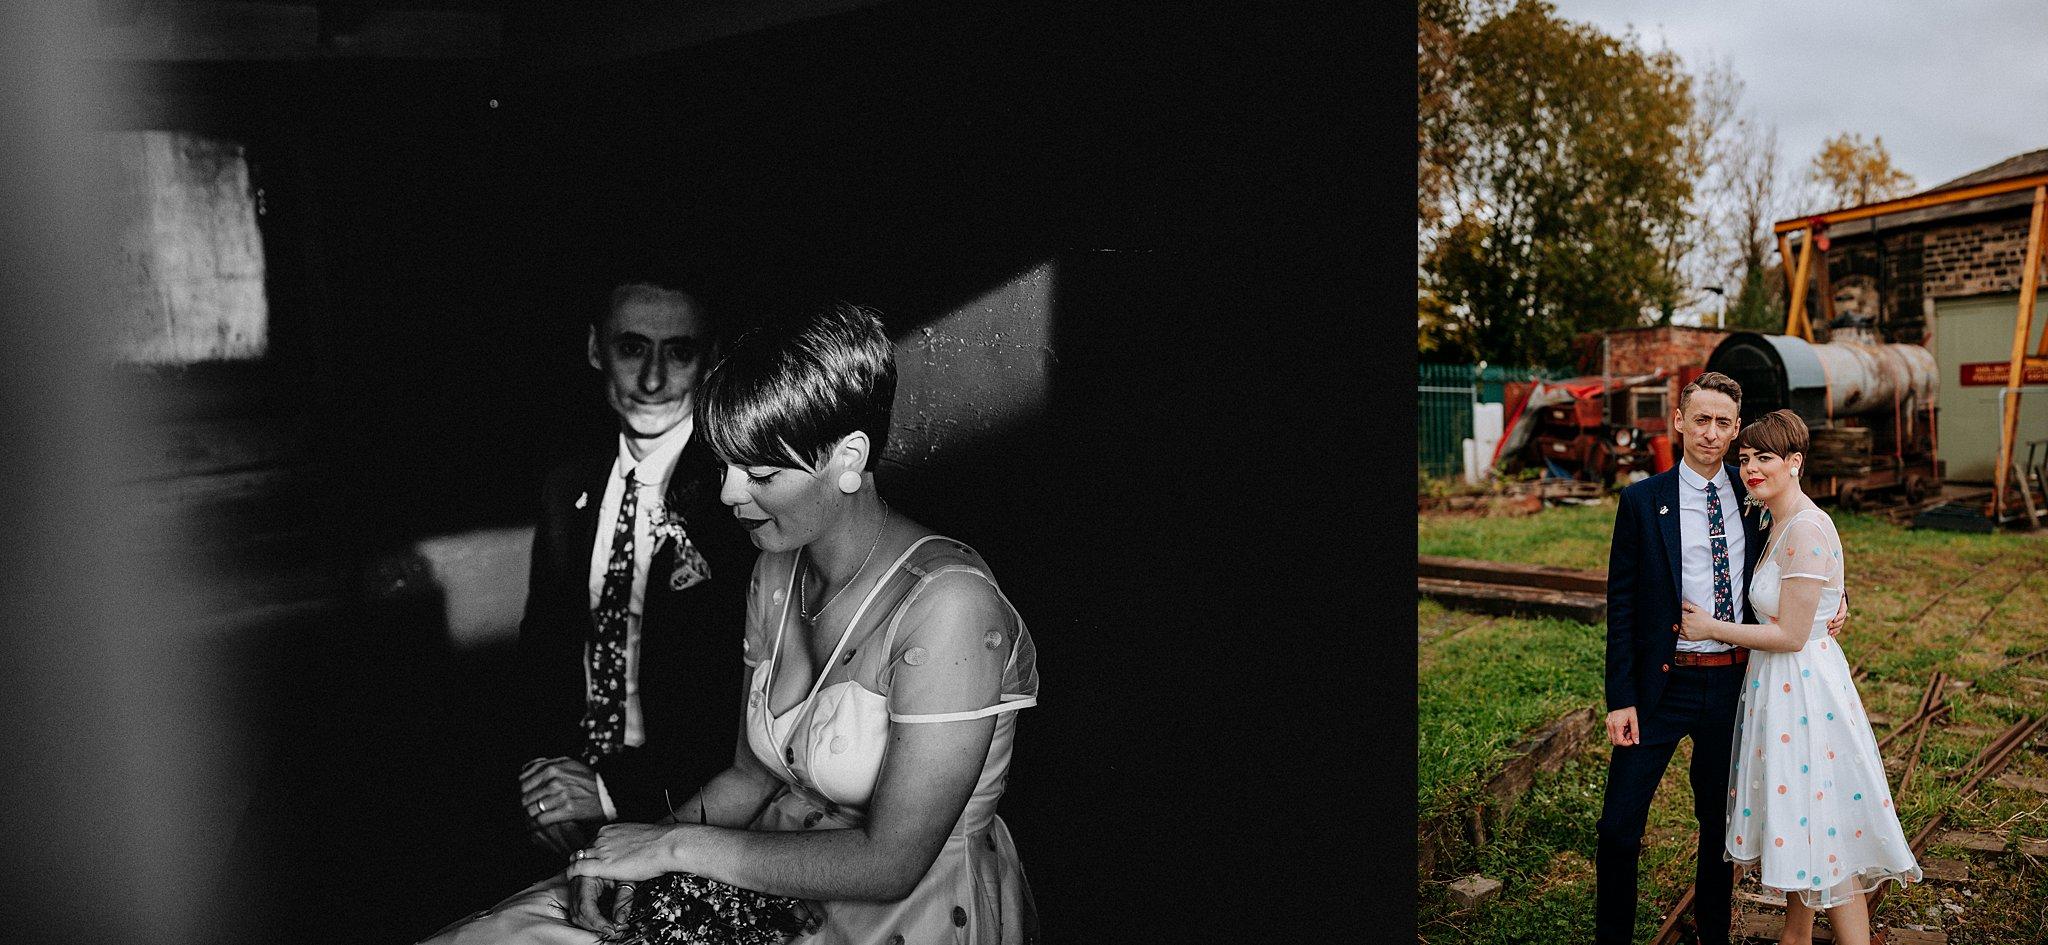 Wedding Photography Alternative North East